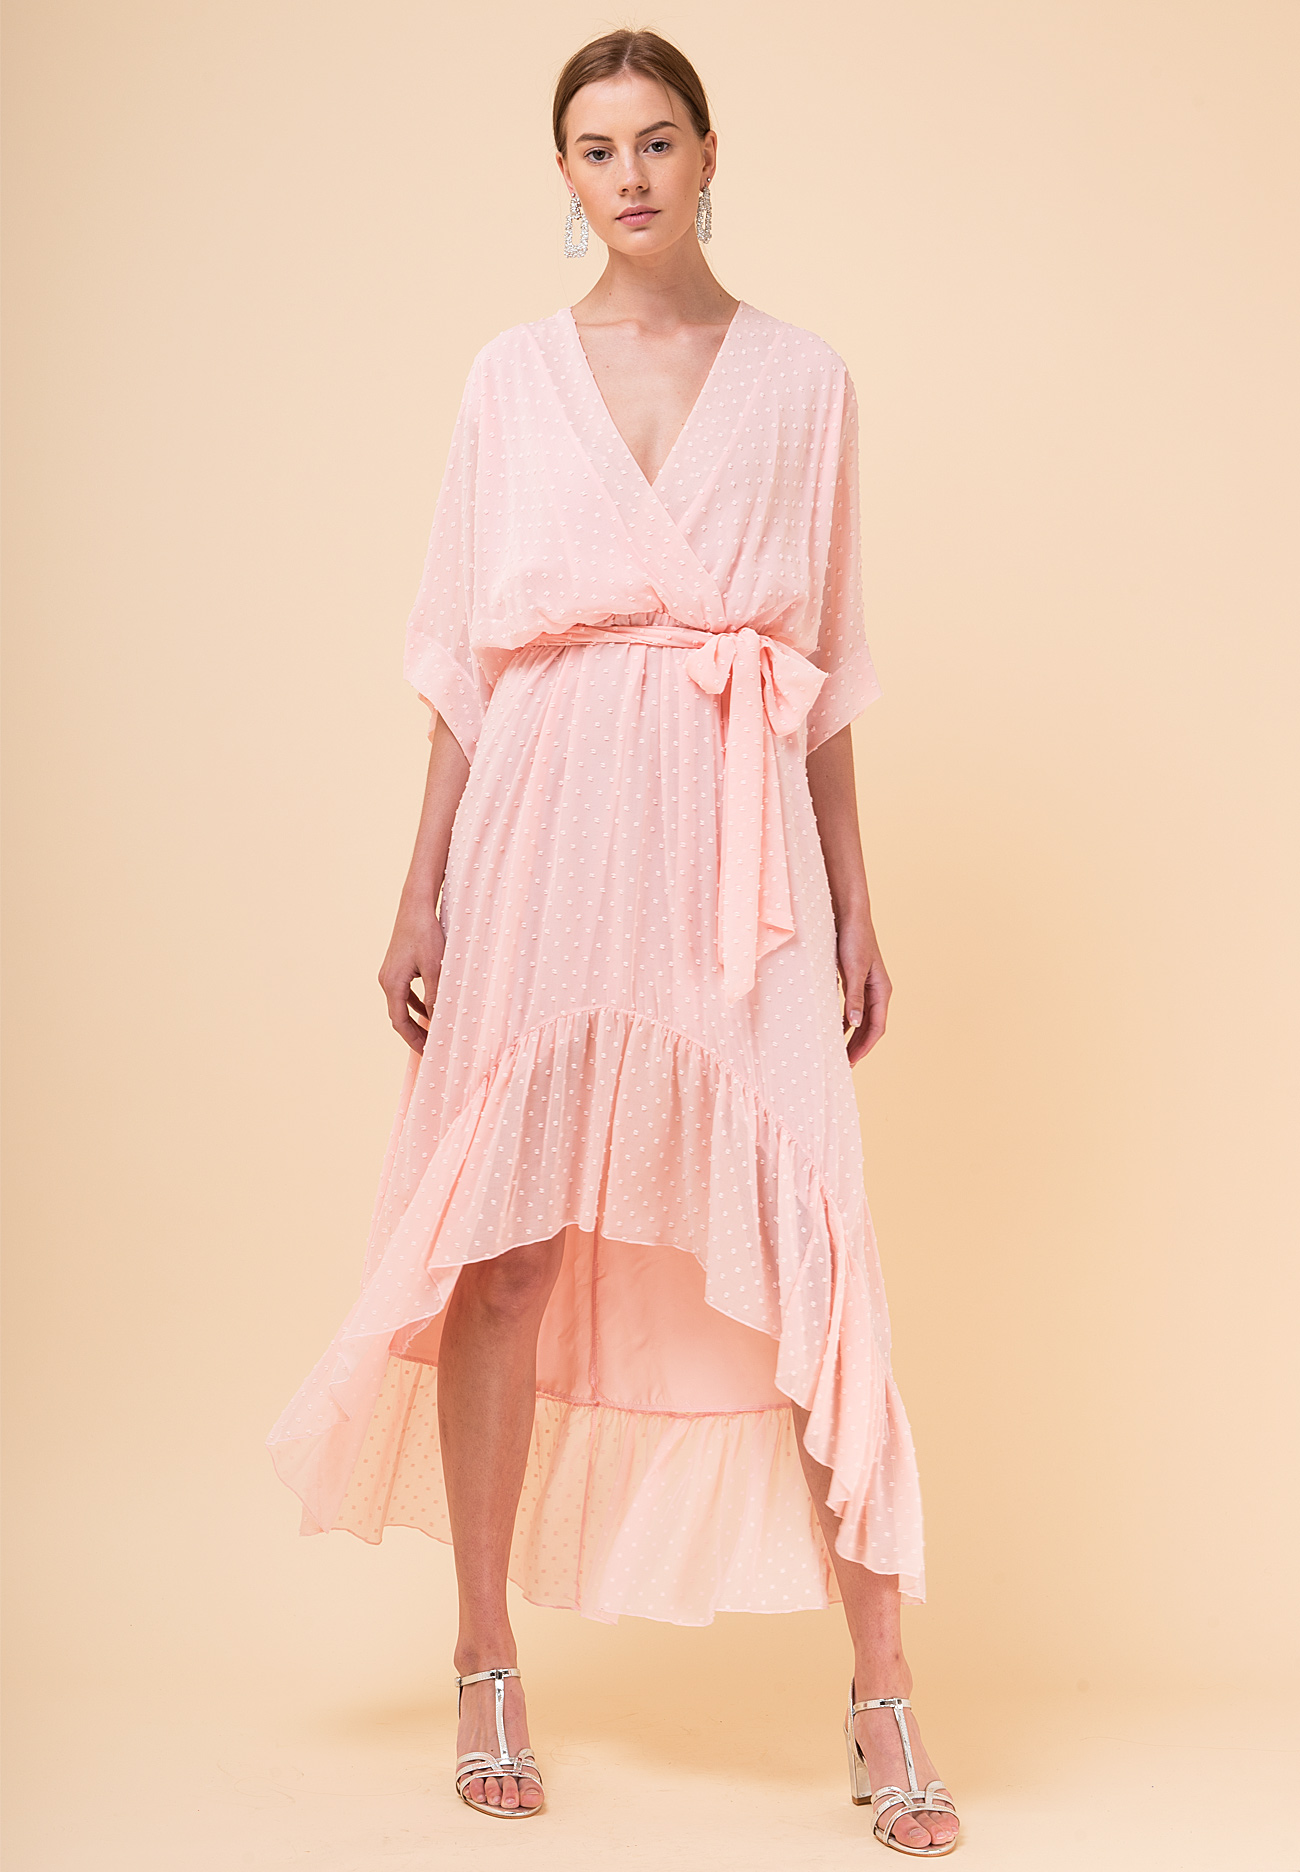 86d186312d71 Κρουαζέ φόρεμα από ανάγλυφο ύφασμα - ZIC ZAC